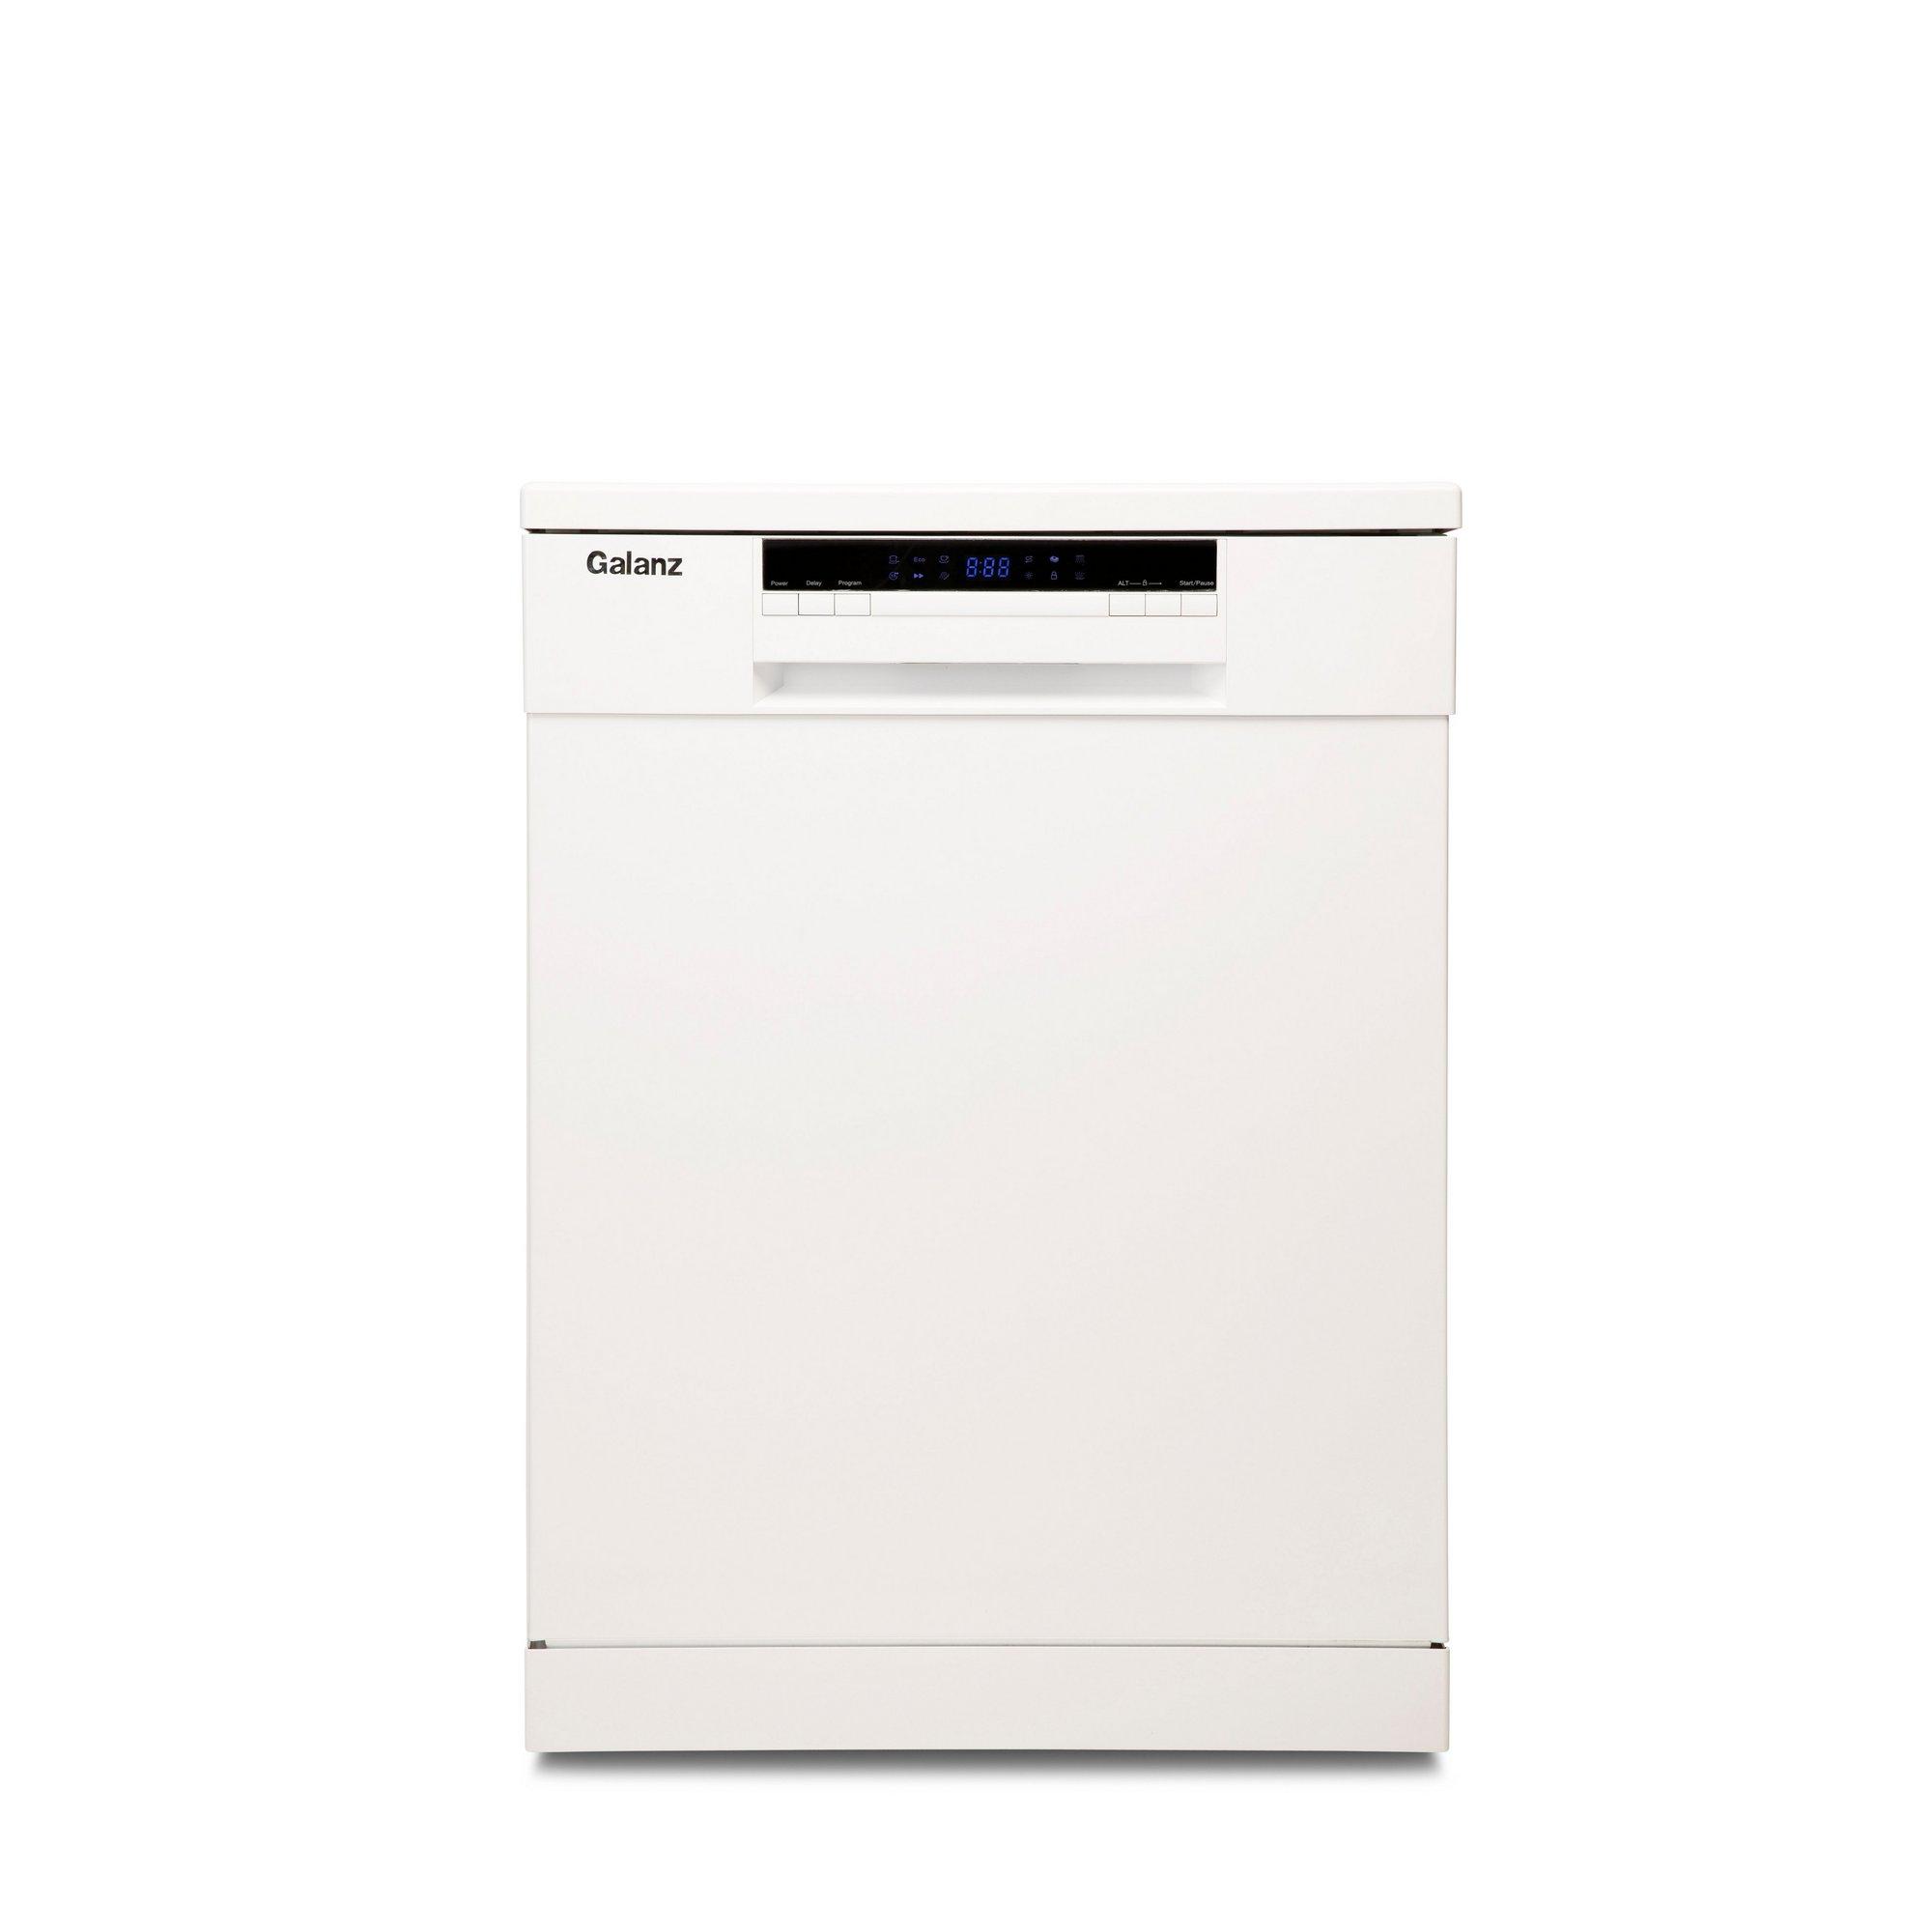 Image of Galanz 14 Place Setting Dishwasher